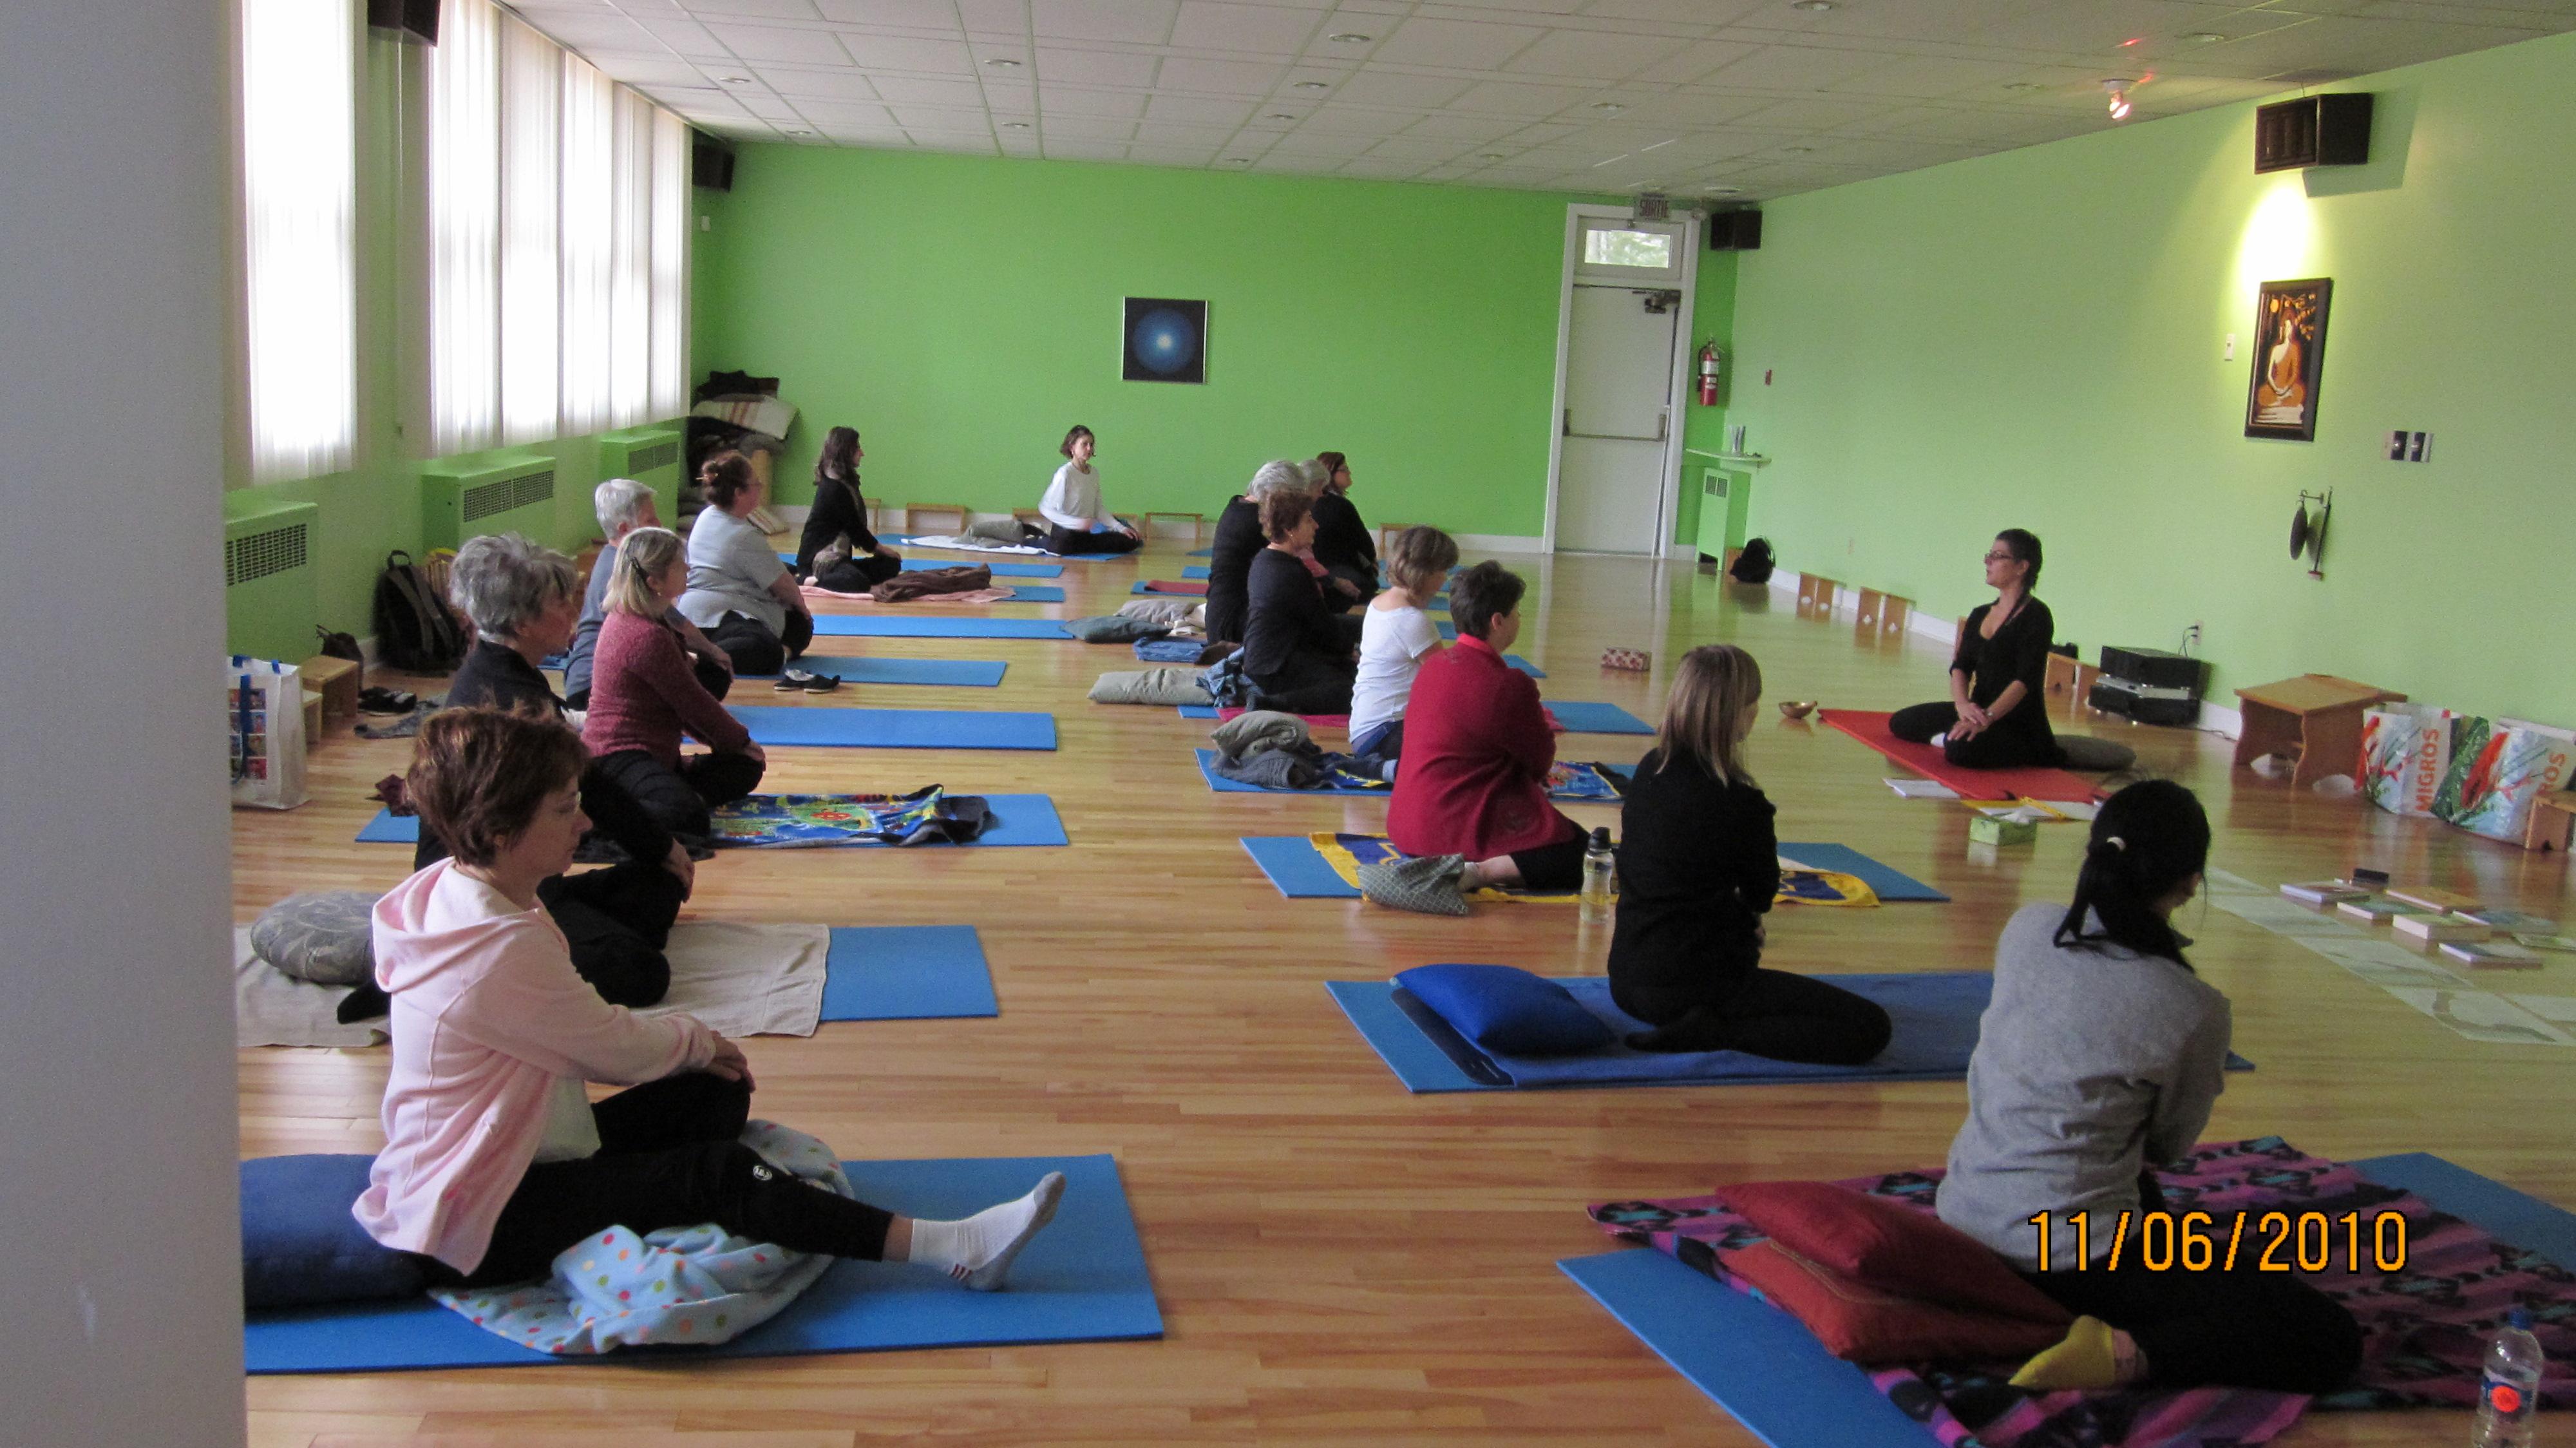 yoga tao ste centre de yoga sainte foy. Black Bedroom Furniture Sets. Home Design Ideas